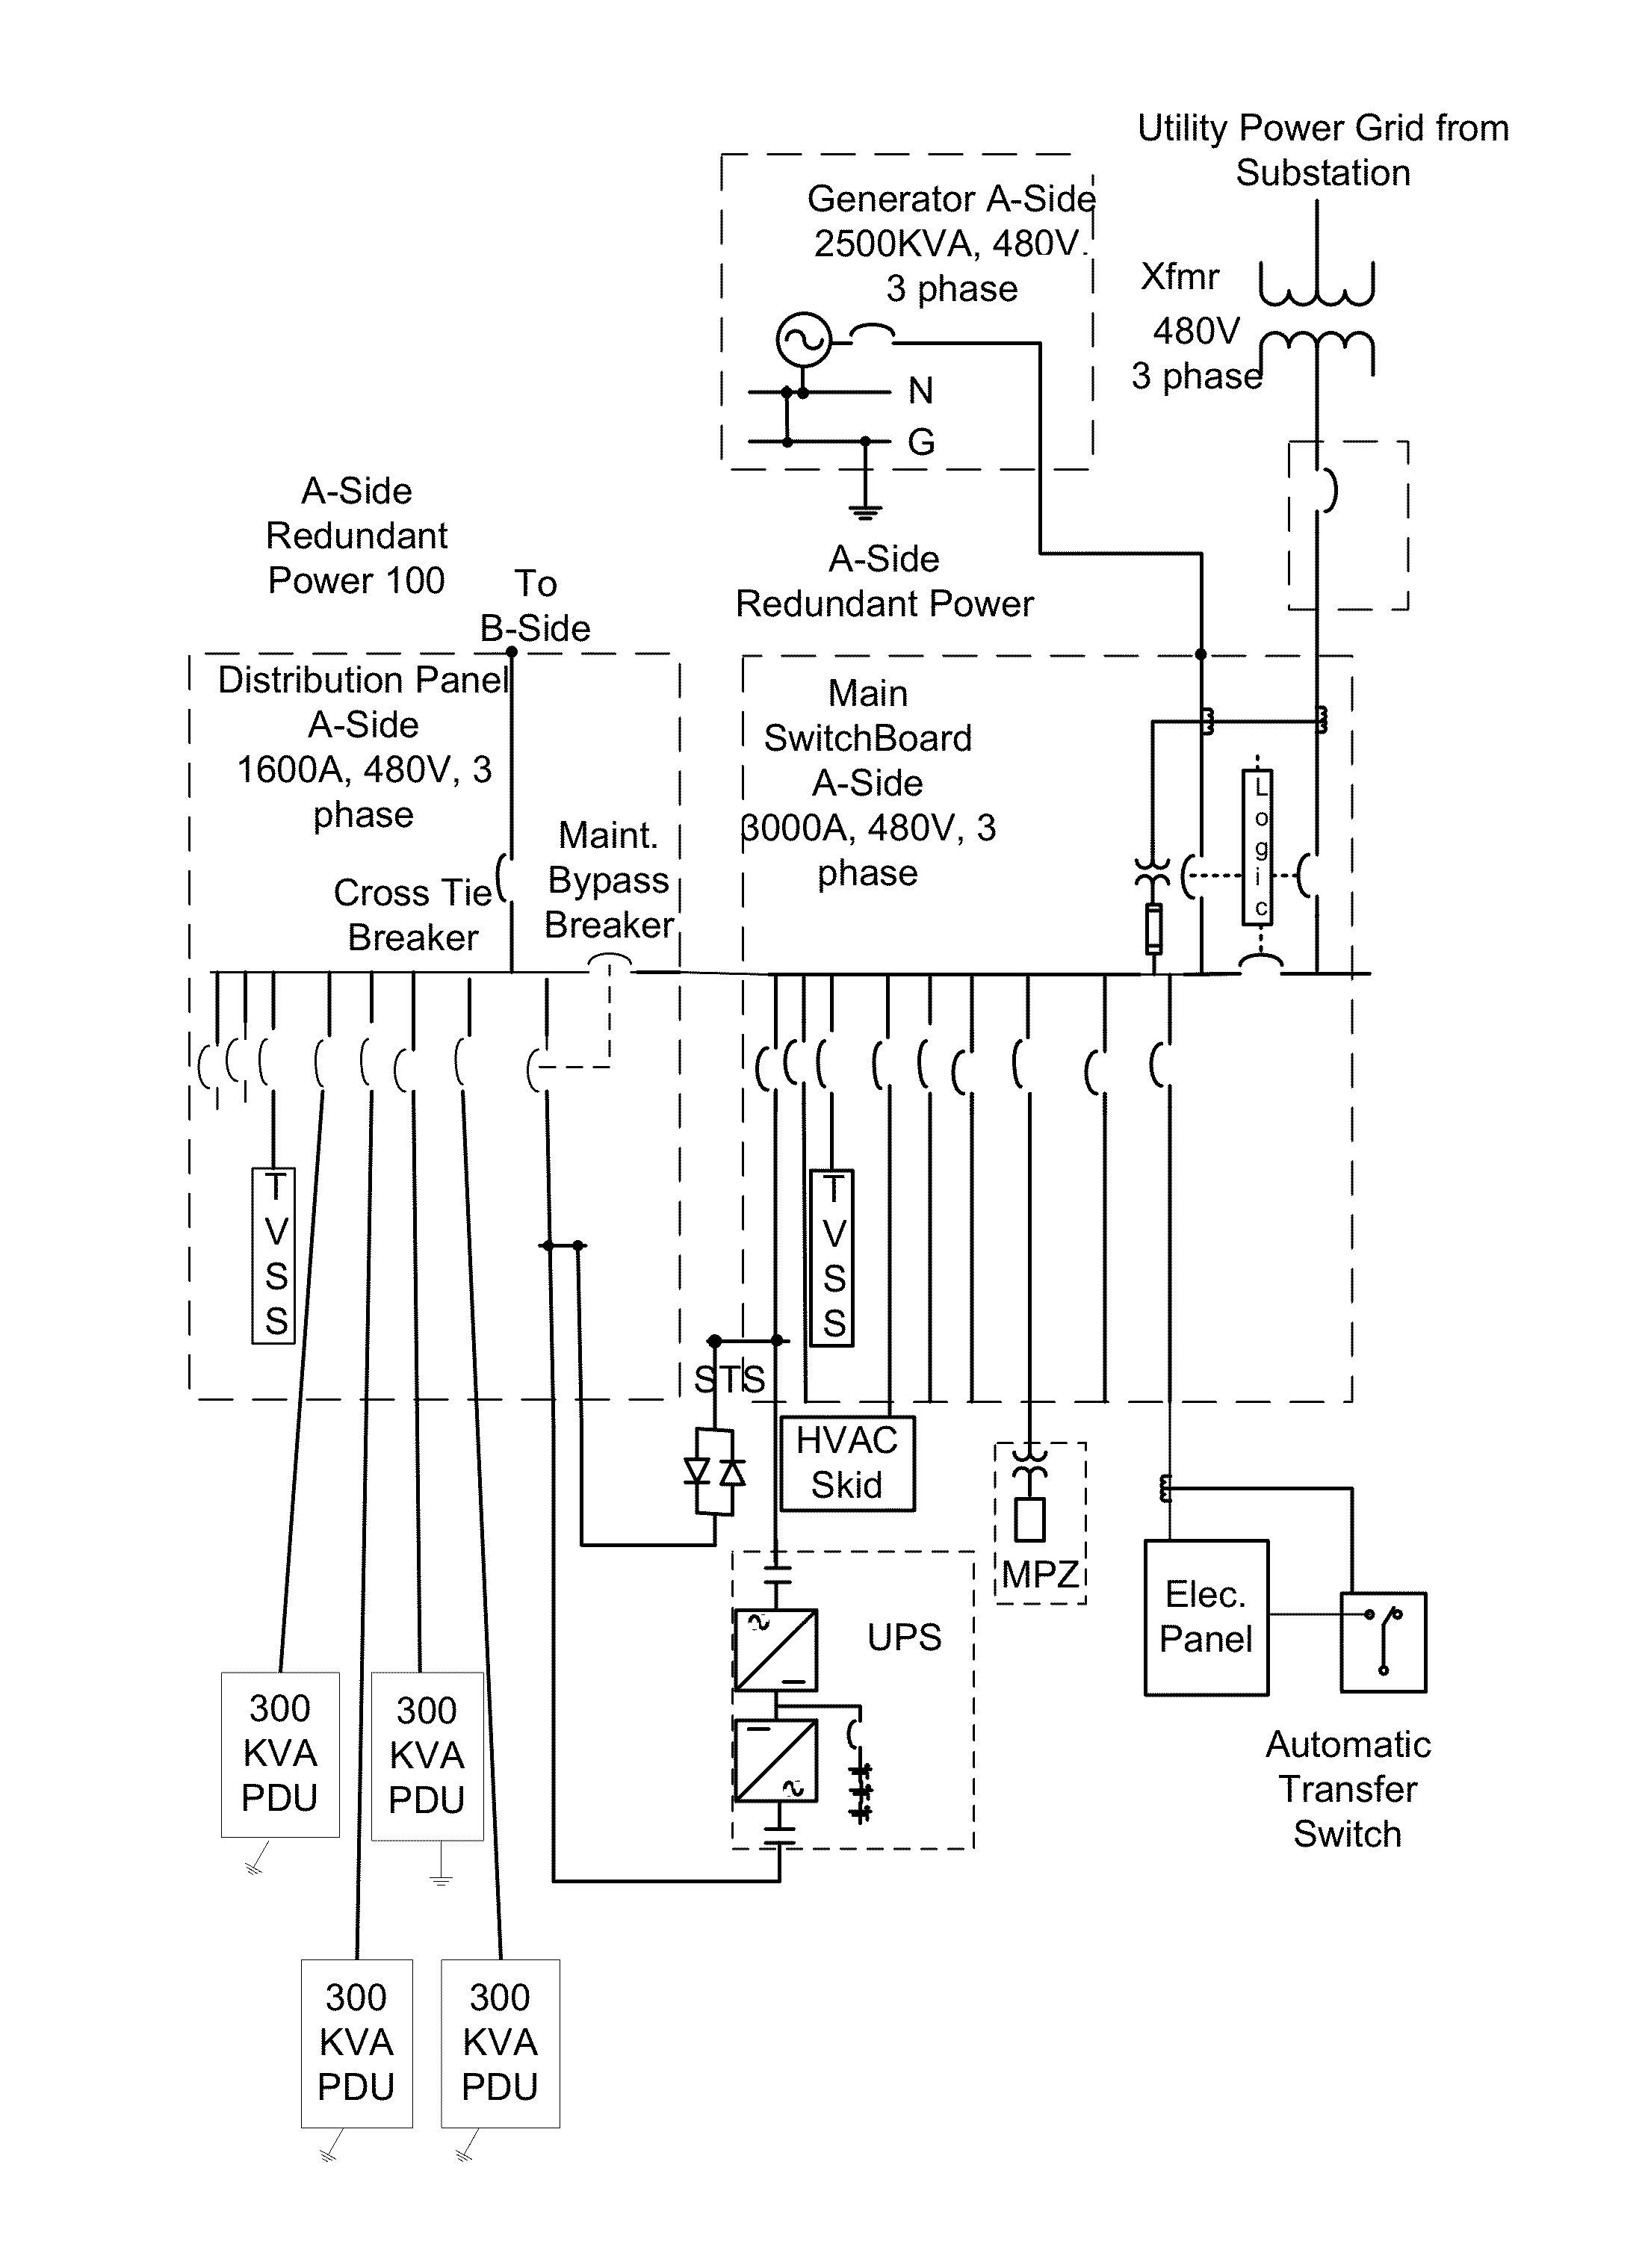 New Pdl Dimmer Switch Wiring Diagram Diagram Diagramtemplate Diagramsample Diagrama De Circuito Circuito